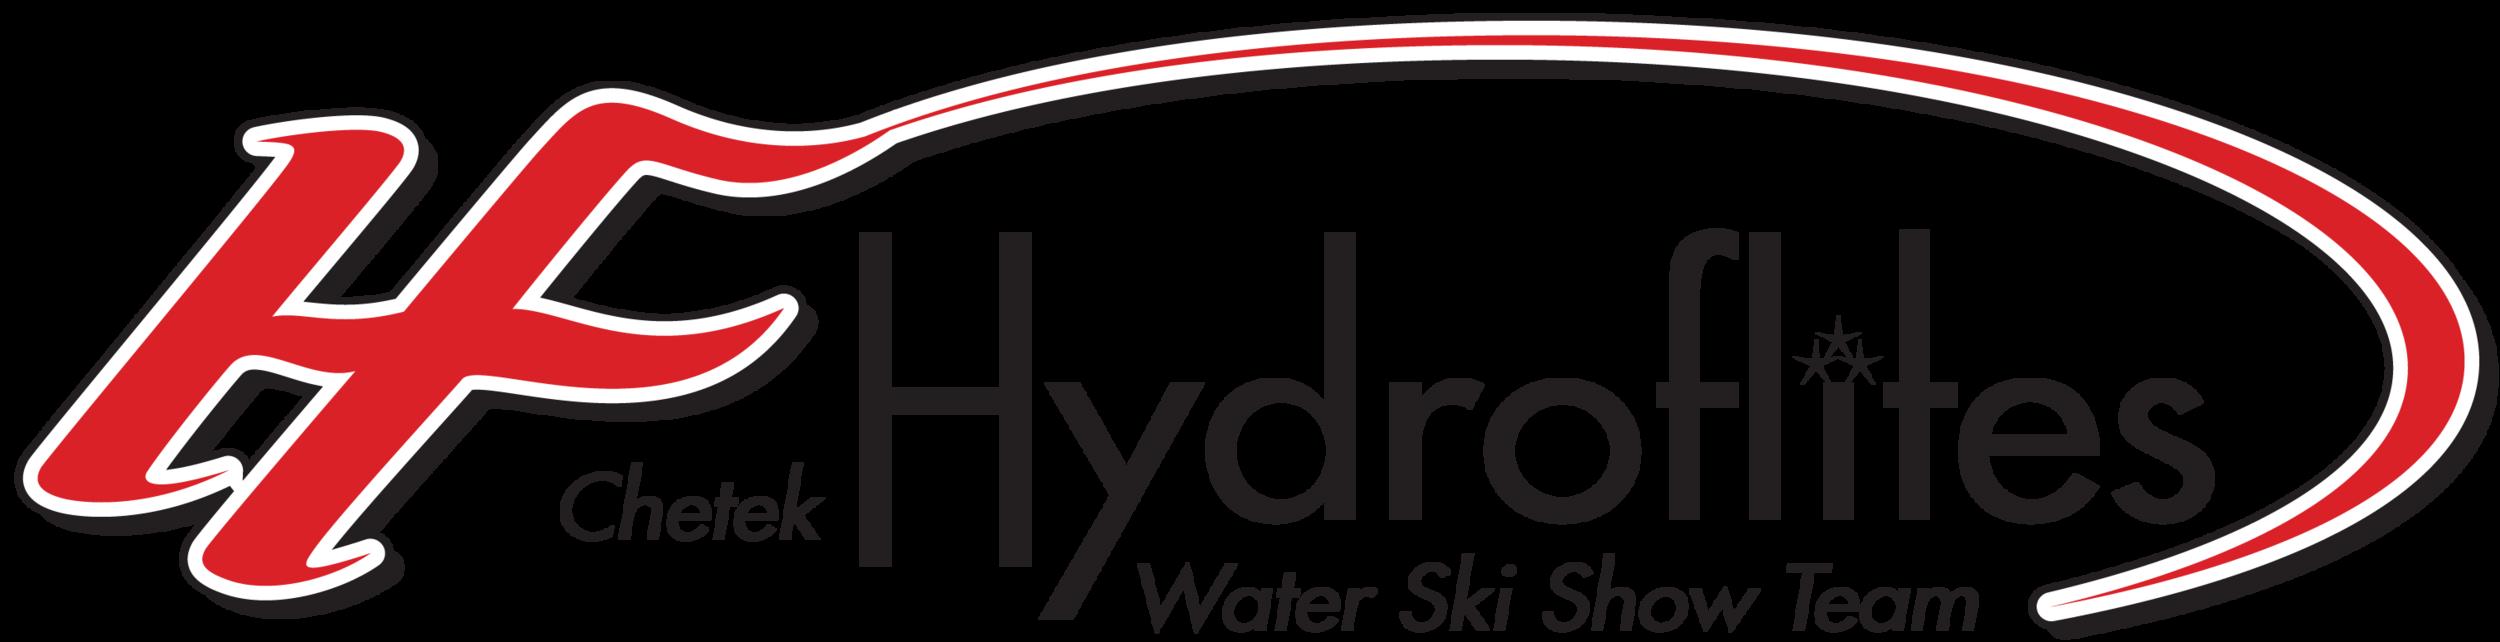 2017 Hydroflites_Logo_Red.png